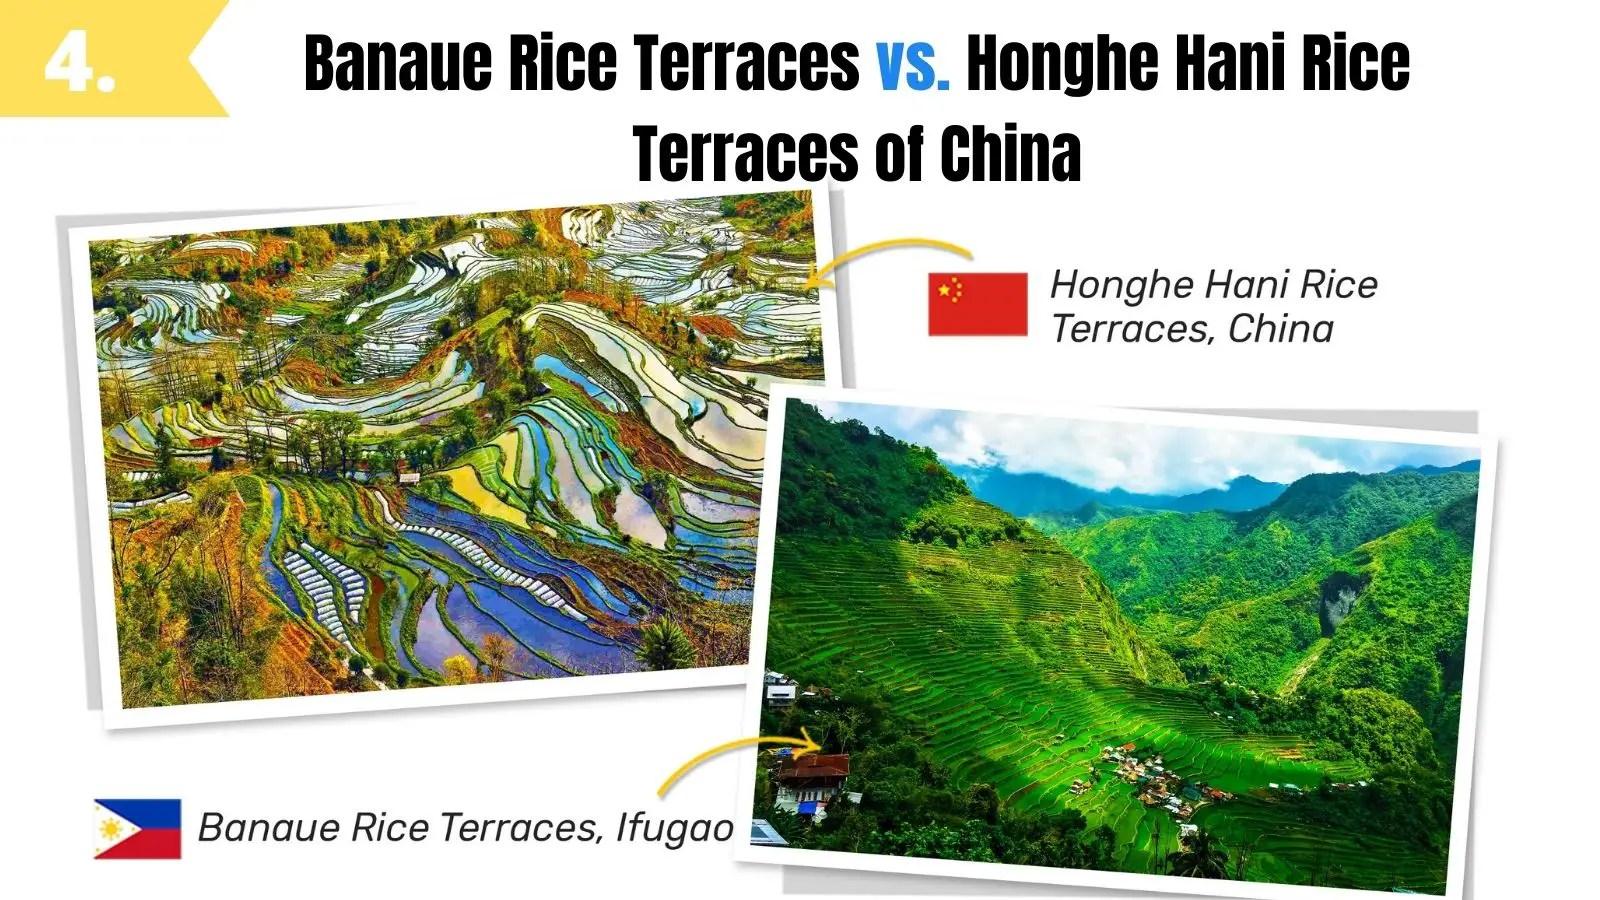 banaue rice terraces look like honghe hani rice terraces china